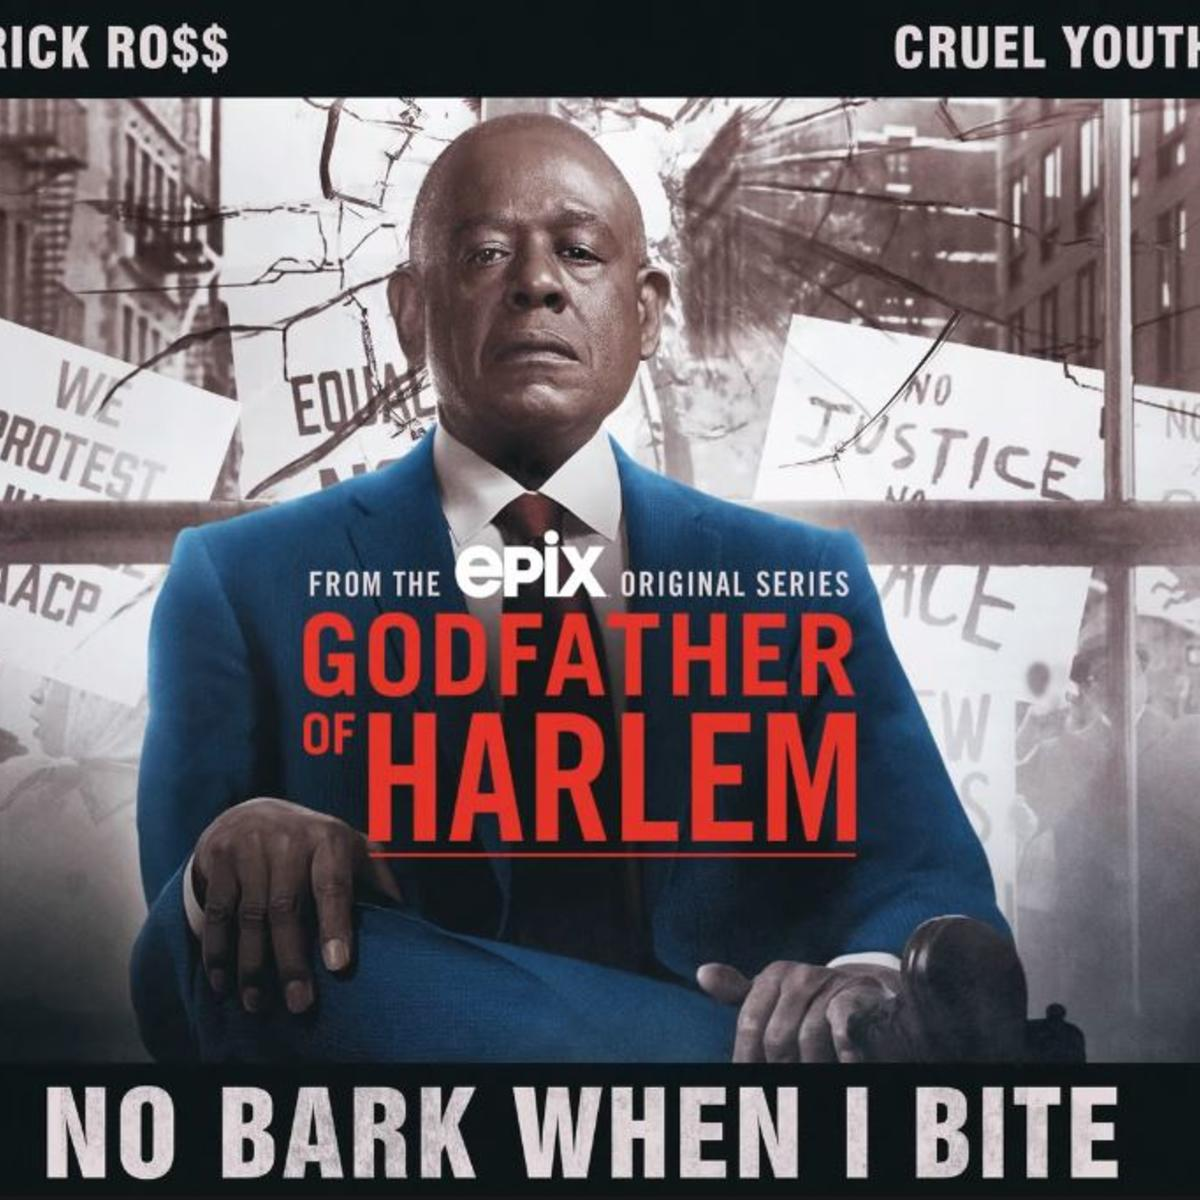 Godfather of Harlem Ft. Rick Ross & Cruel Youth – No Bark When I Bite